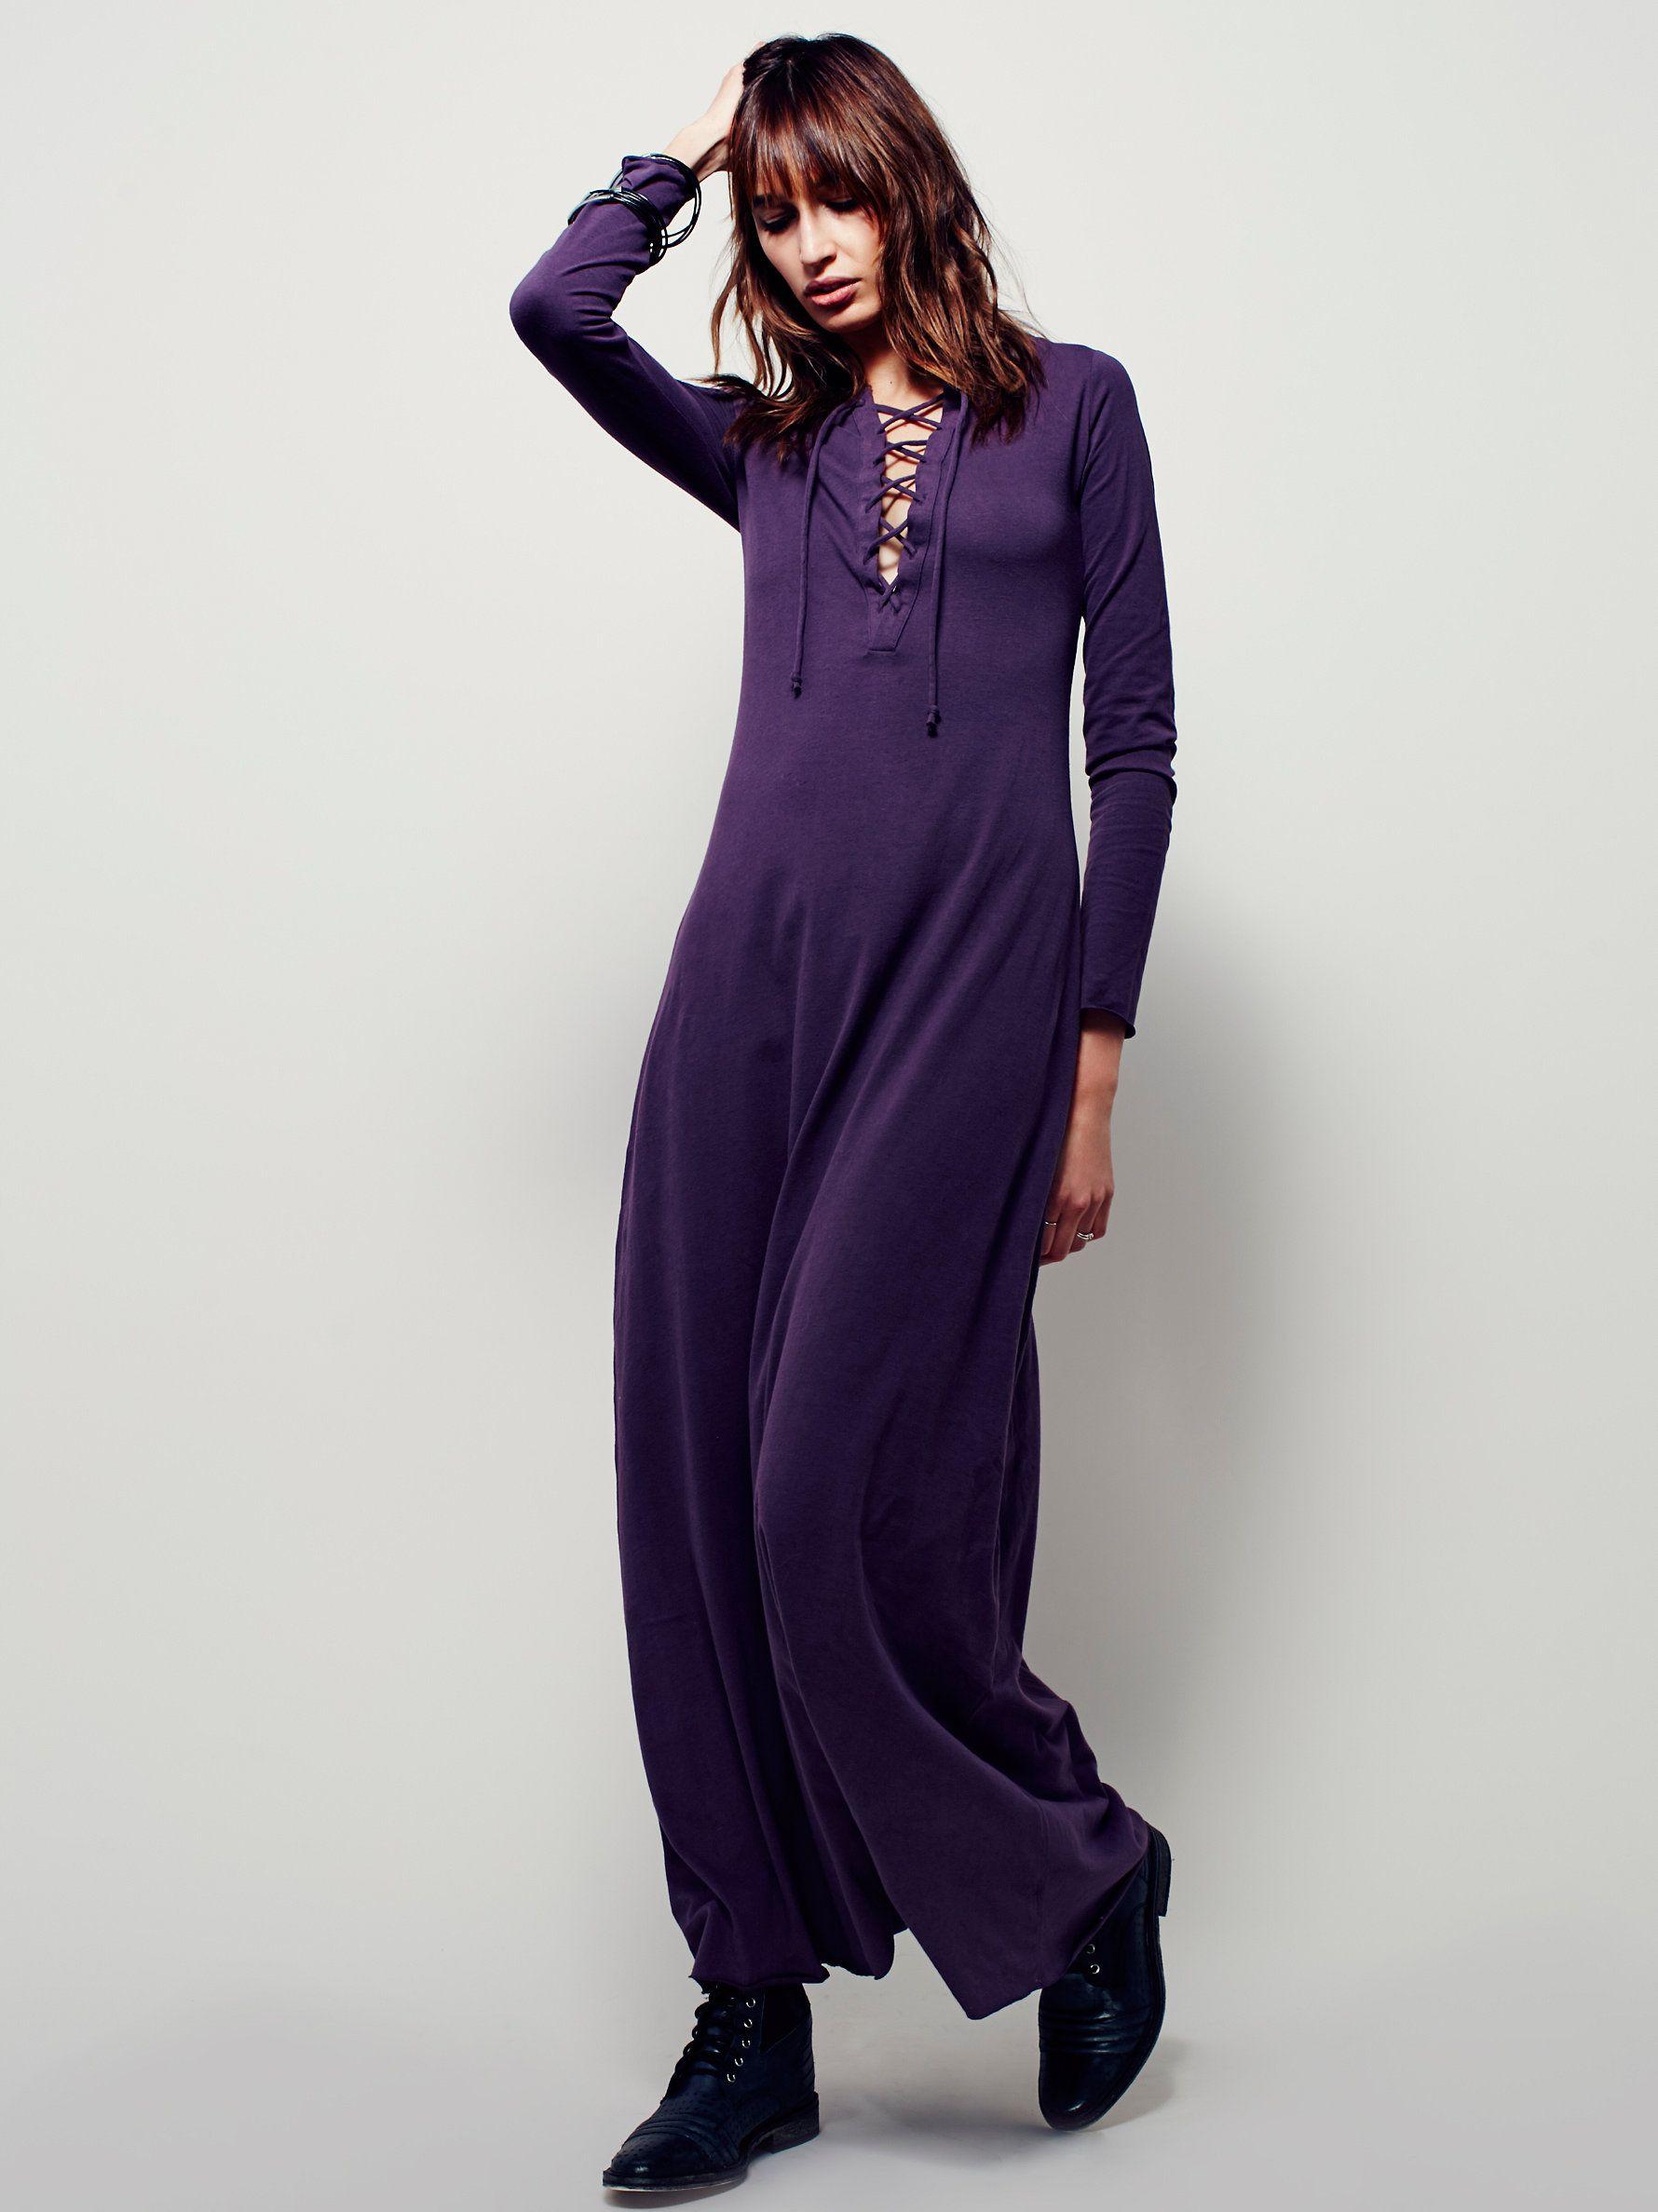 Psychomagic dress super soft long sleeve cotton maxi dress with